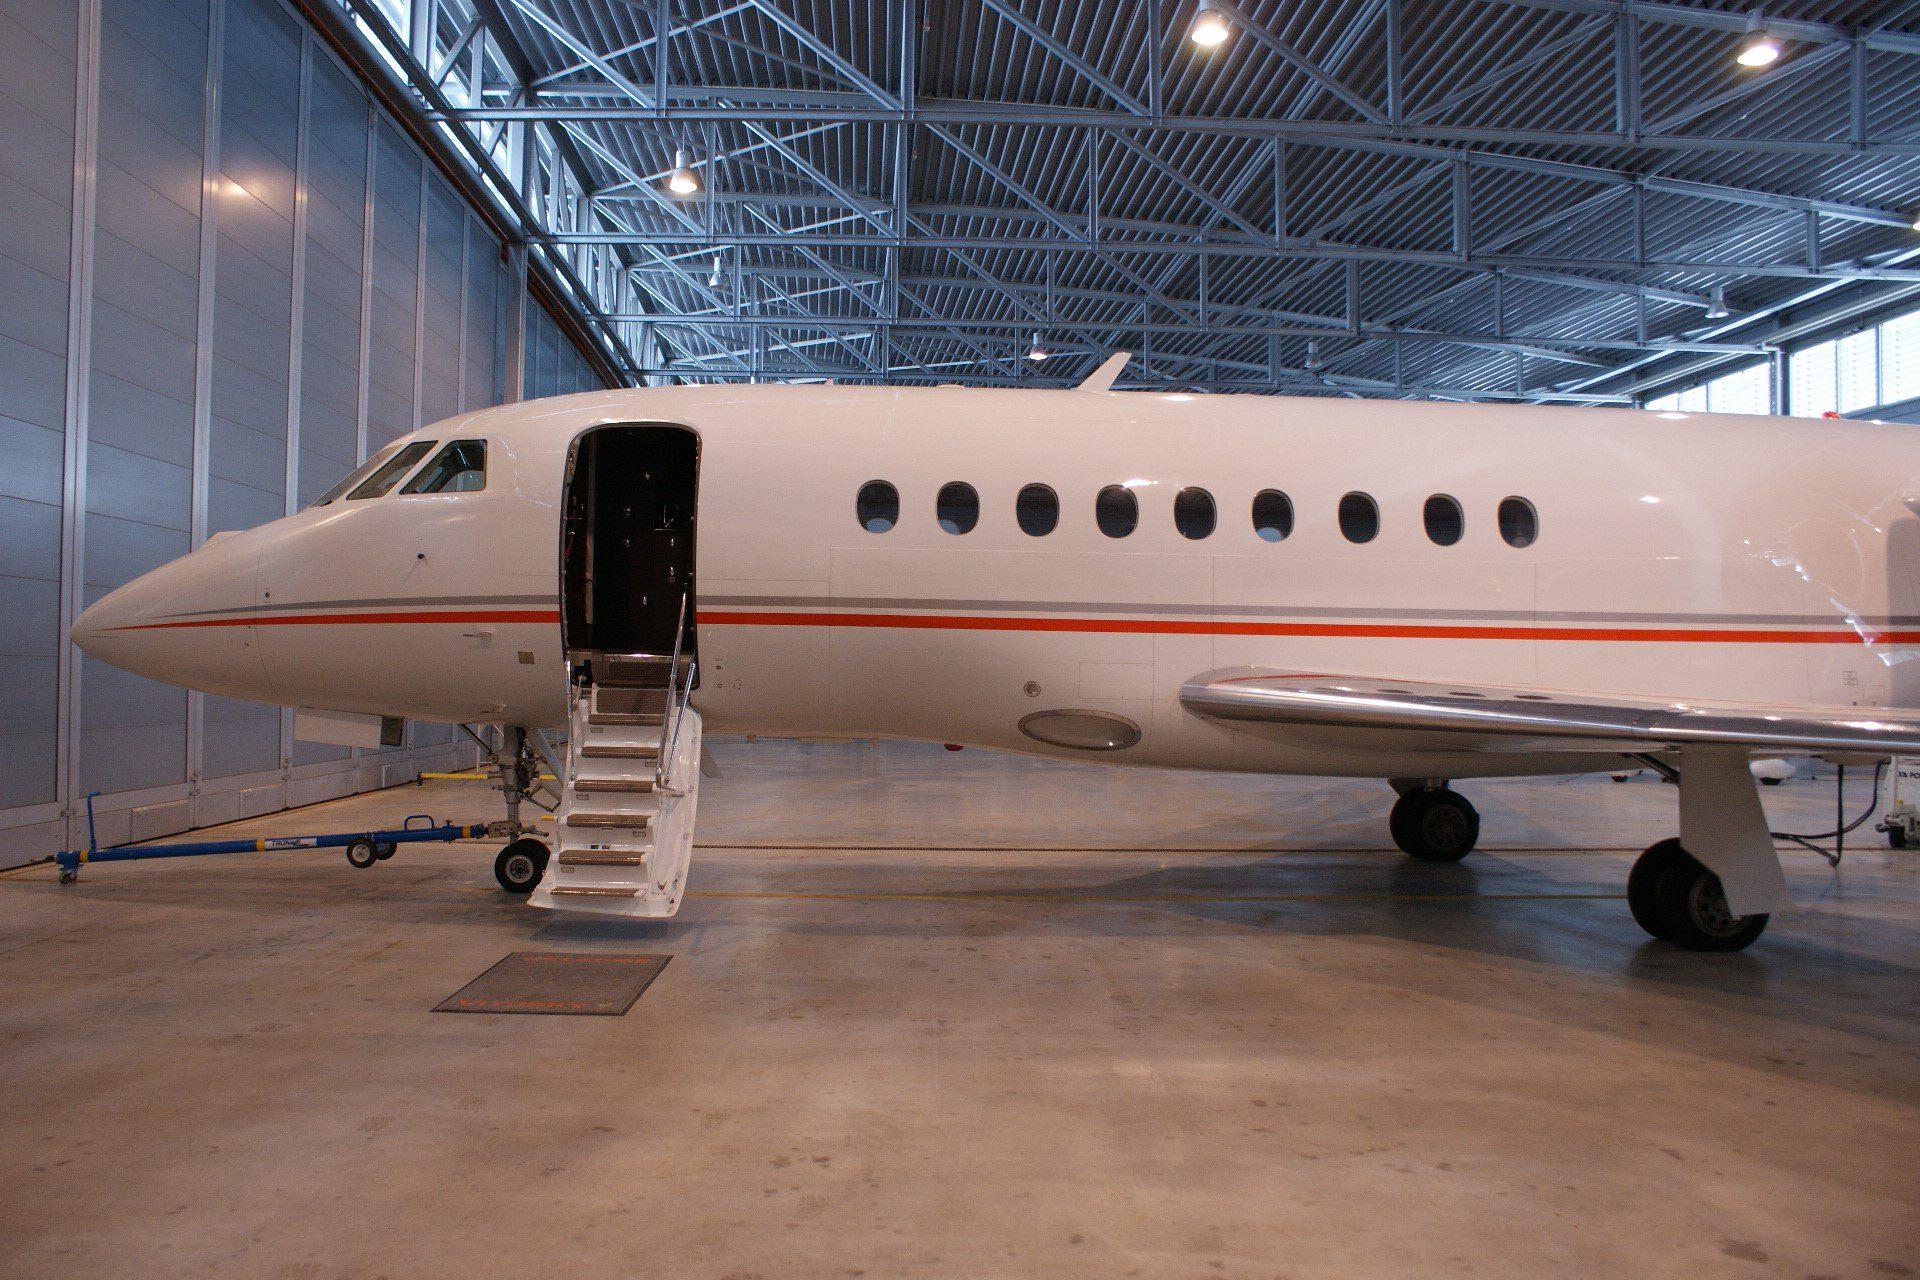 USAircraftSale-2013-Dassault-Falcon-2000LXS-5-263-03172017